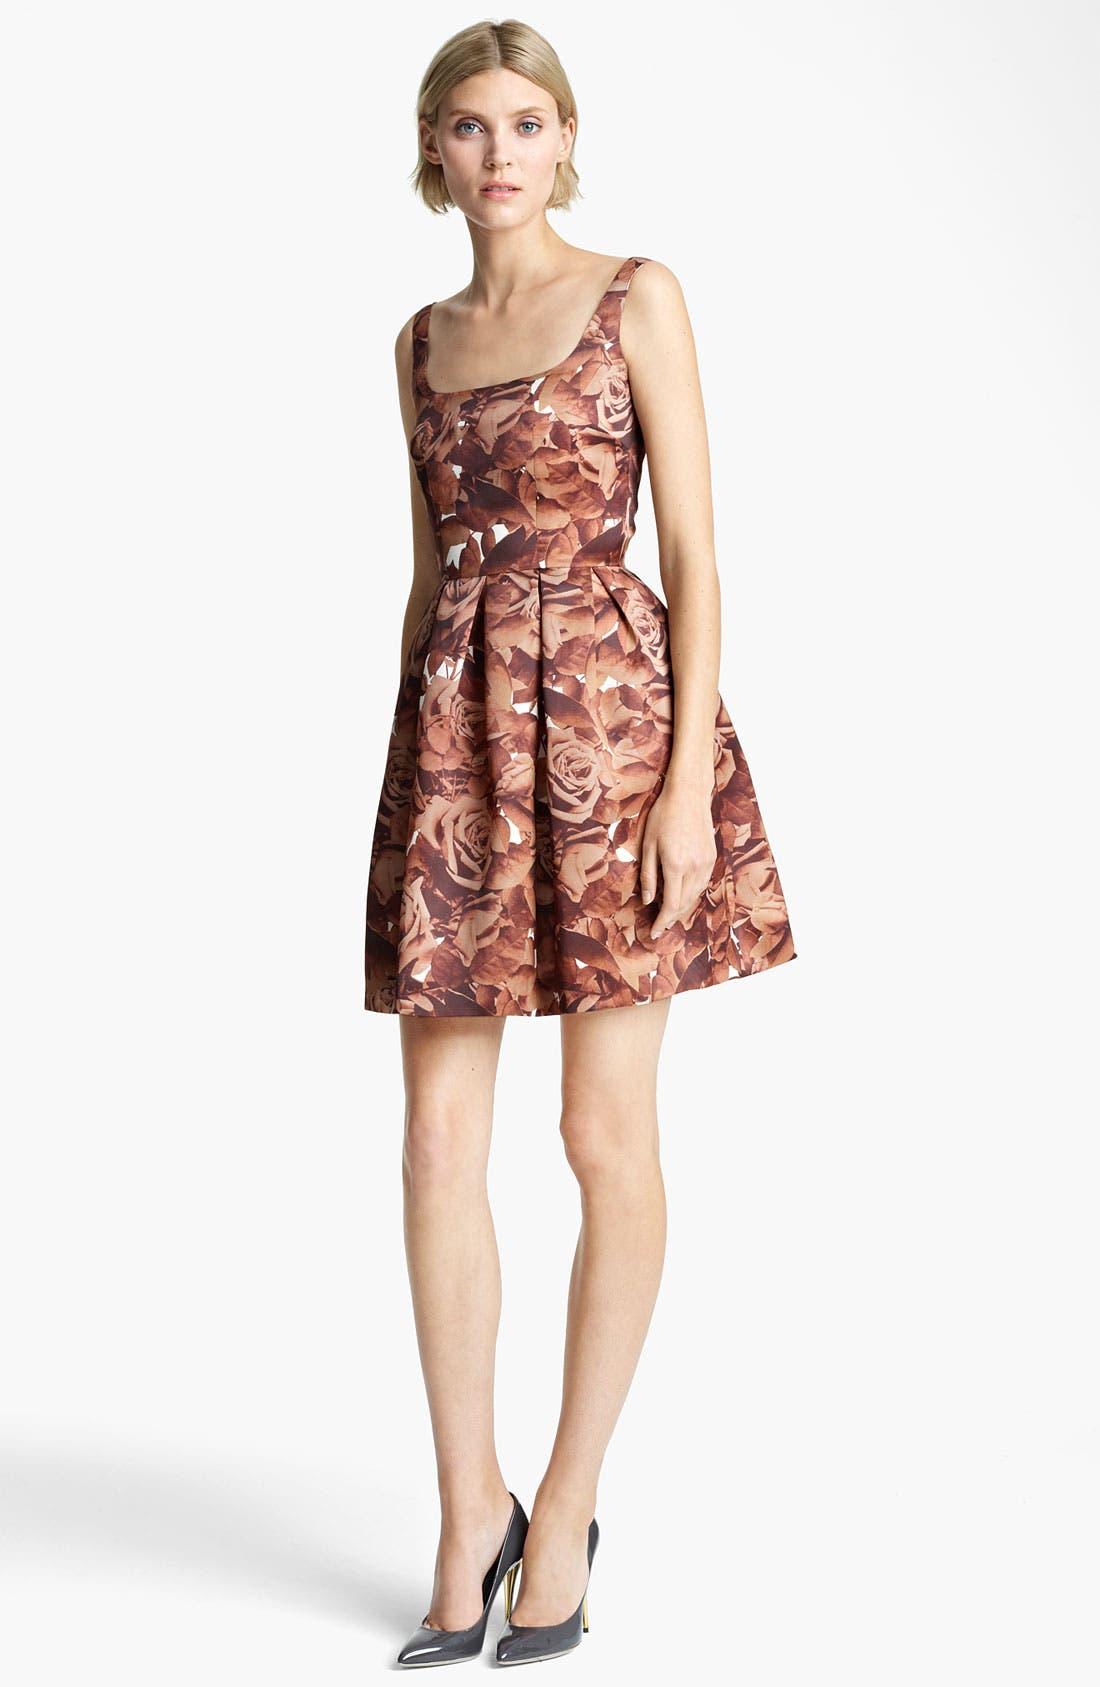 Alternate Image 1 Selected - Christopher Kane Sleeveless Floral Print Dress